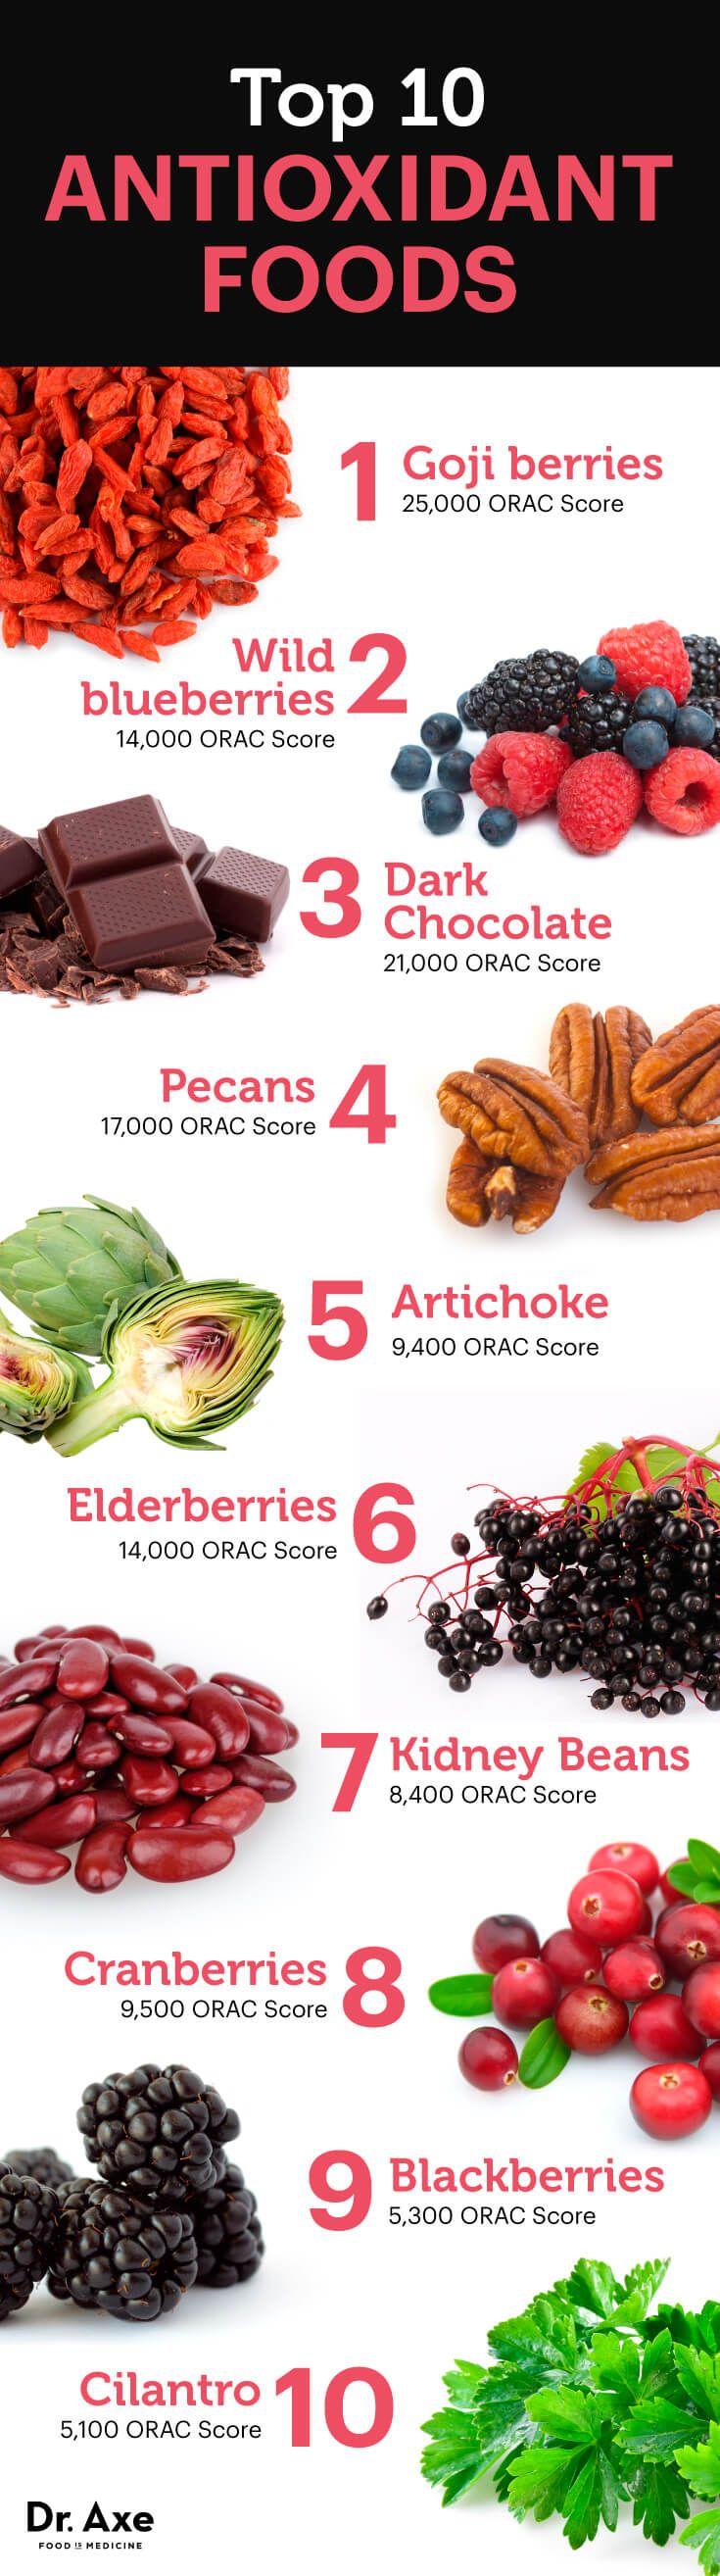 Top 10 Antioxidants Foods Complete Lean Belly Breakthrough System http://leanbellybreakthrough2017.blogspot.com.co/